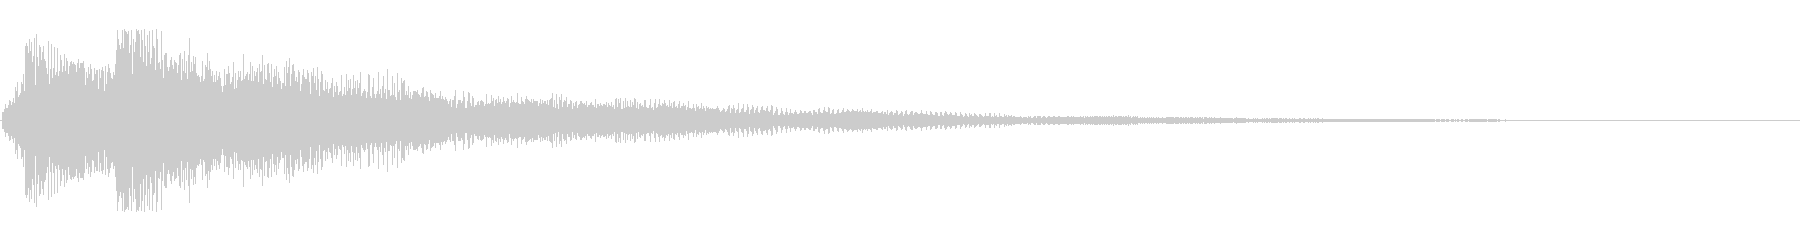 【GAME系】連鎖/パズル/3コンボの未再生の波形